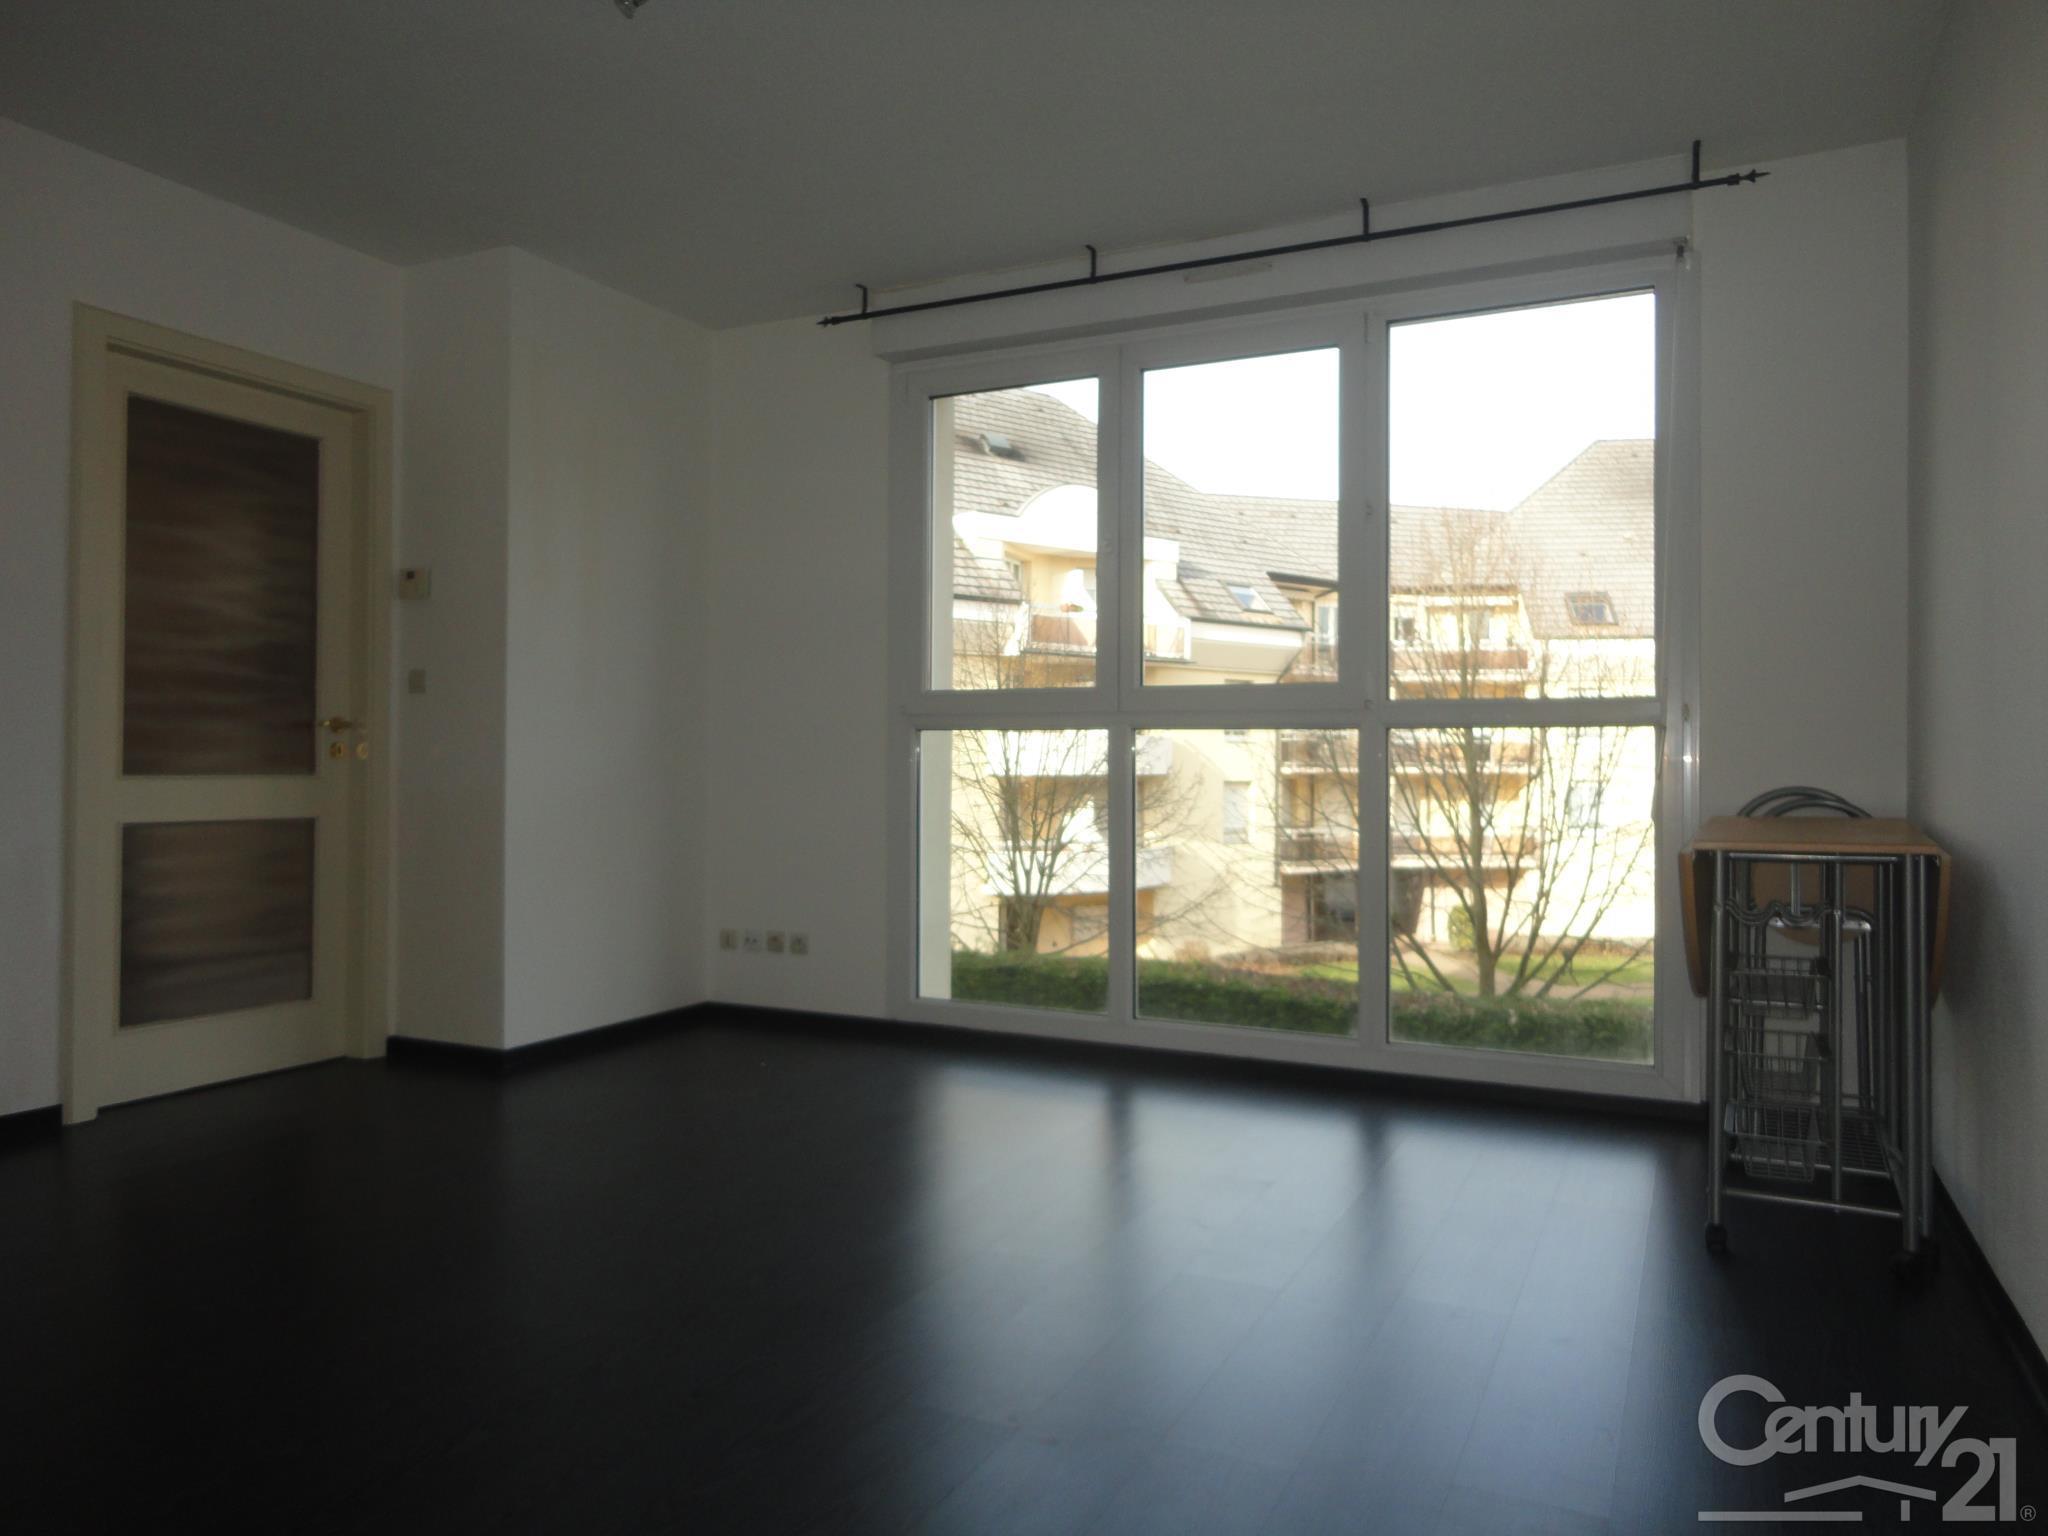 appartement f1 1 pi 232 ce 224 vendre illkirch graffenstaden 67400 ref 20548 century 21